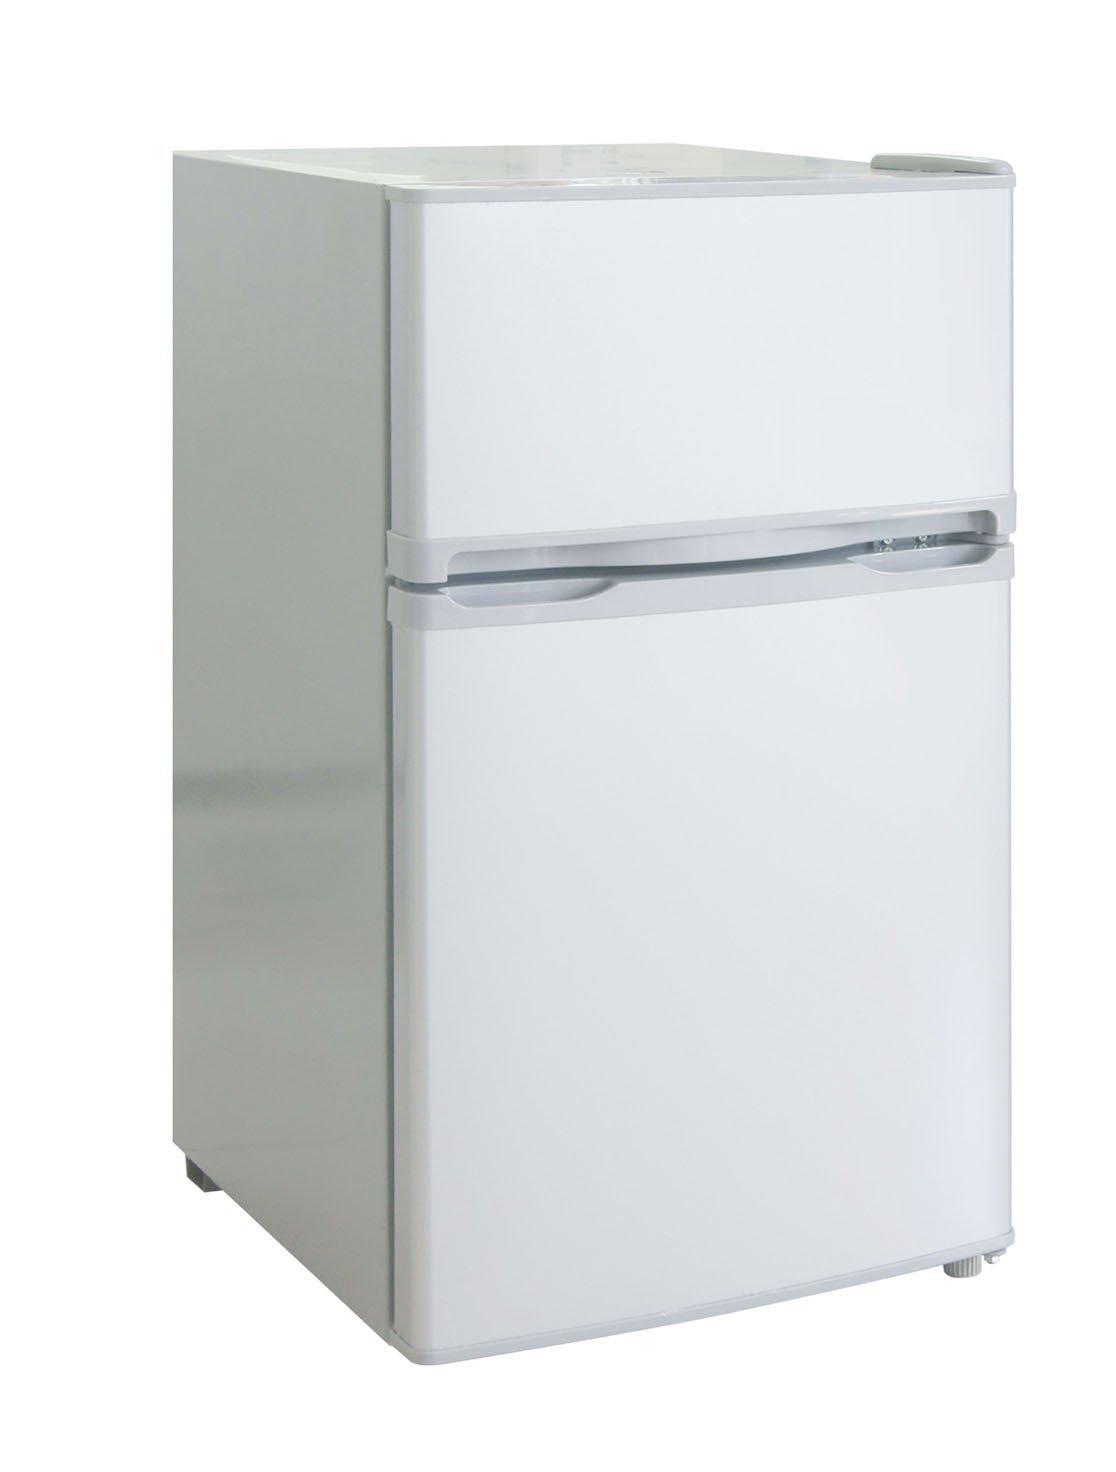 RCA-Igloo 3.2 Cubic Foot 2 Door Fridge and Freezer, White